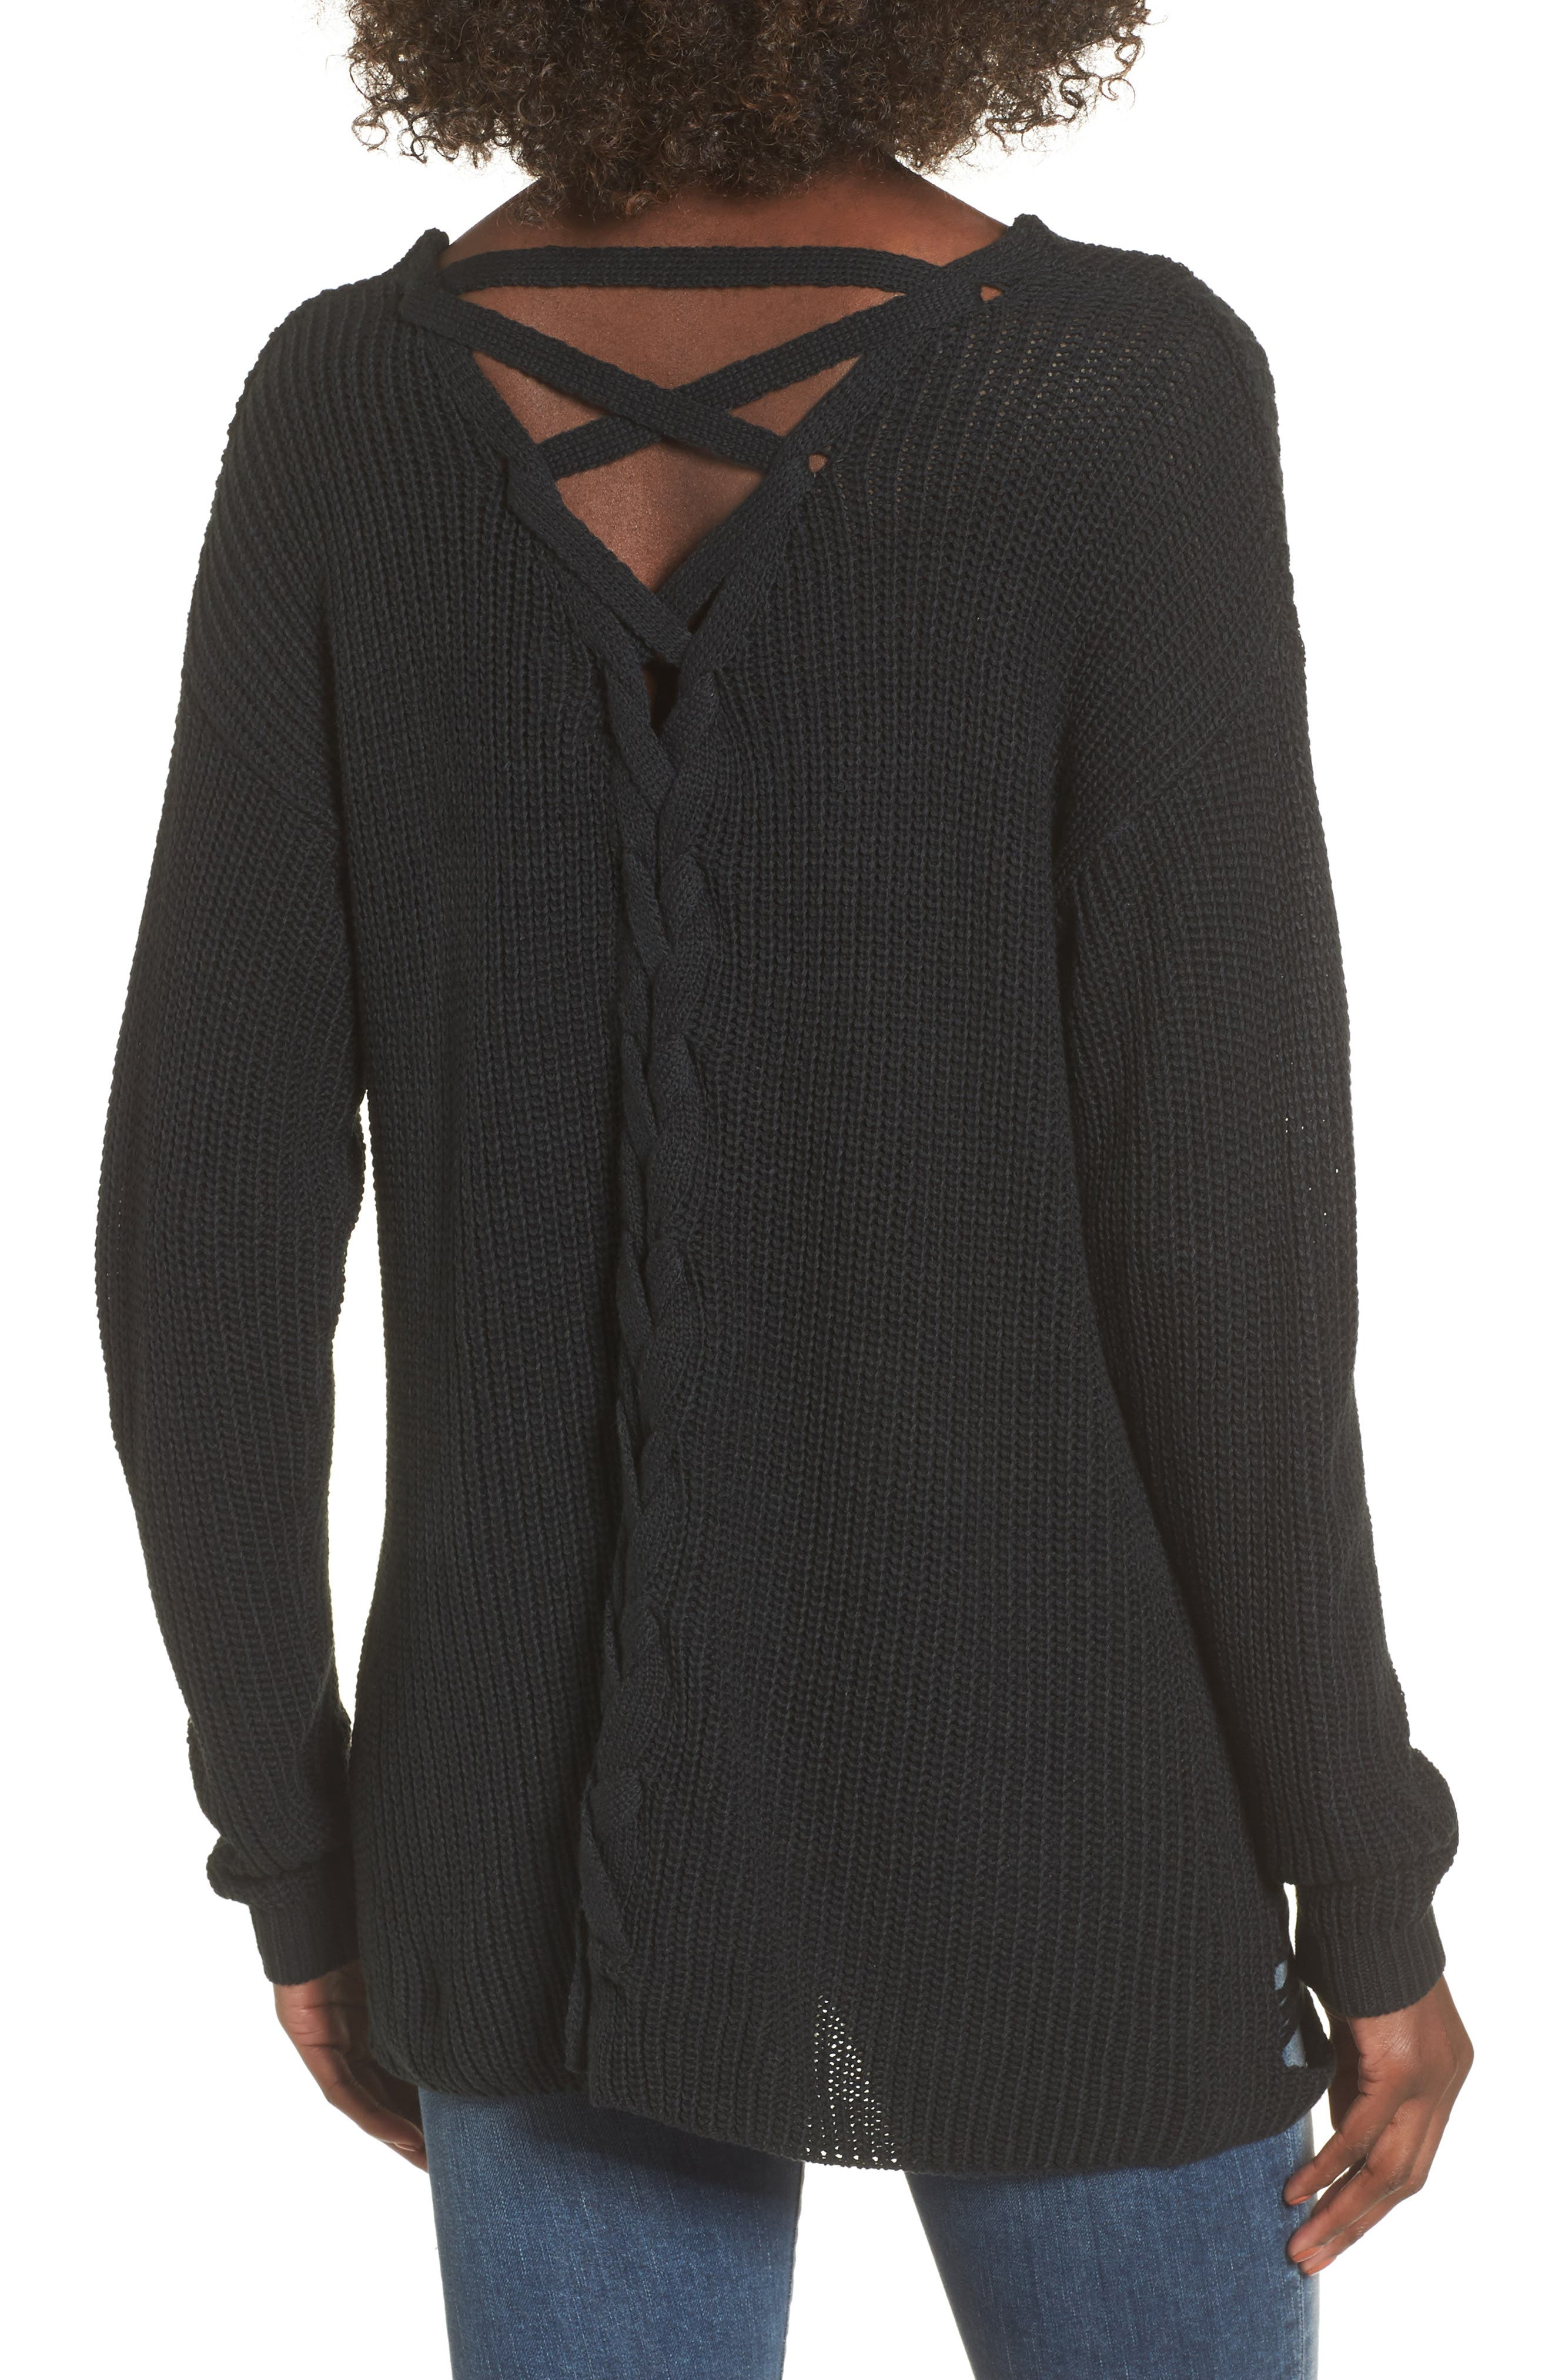 Cyndi Sweater,                             Alternate thumbnail 3, color,                             Black